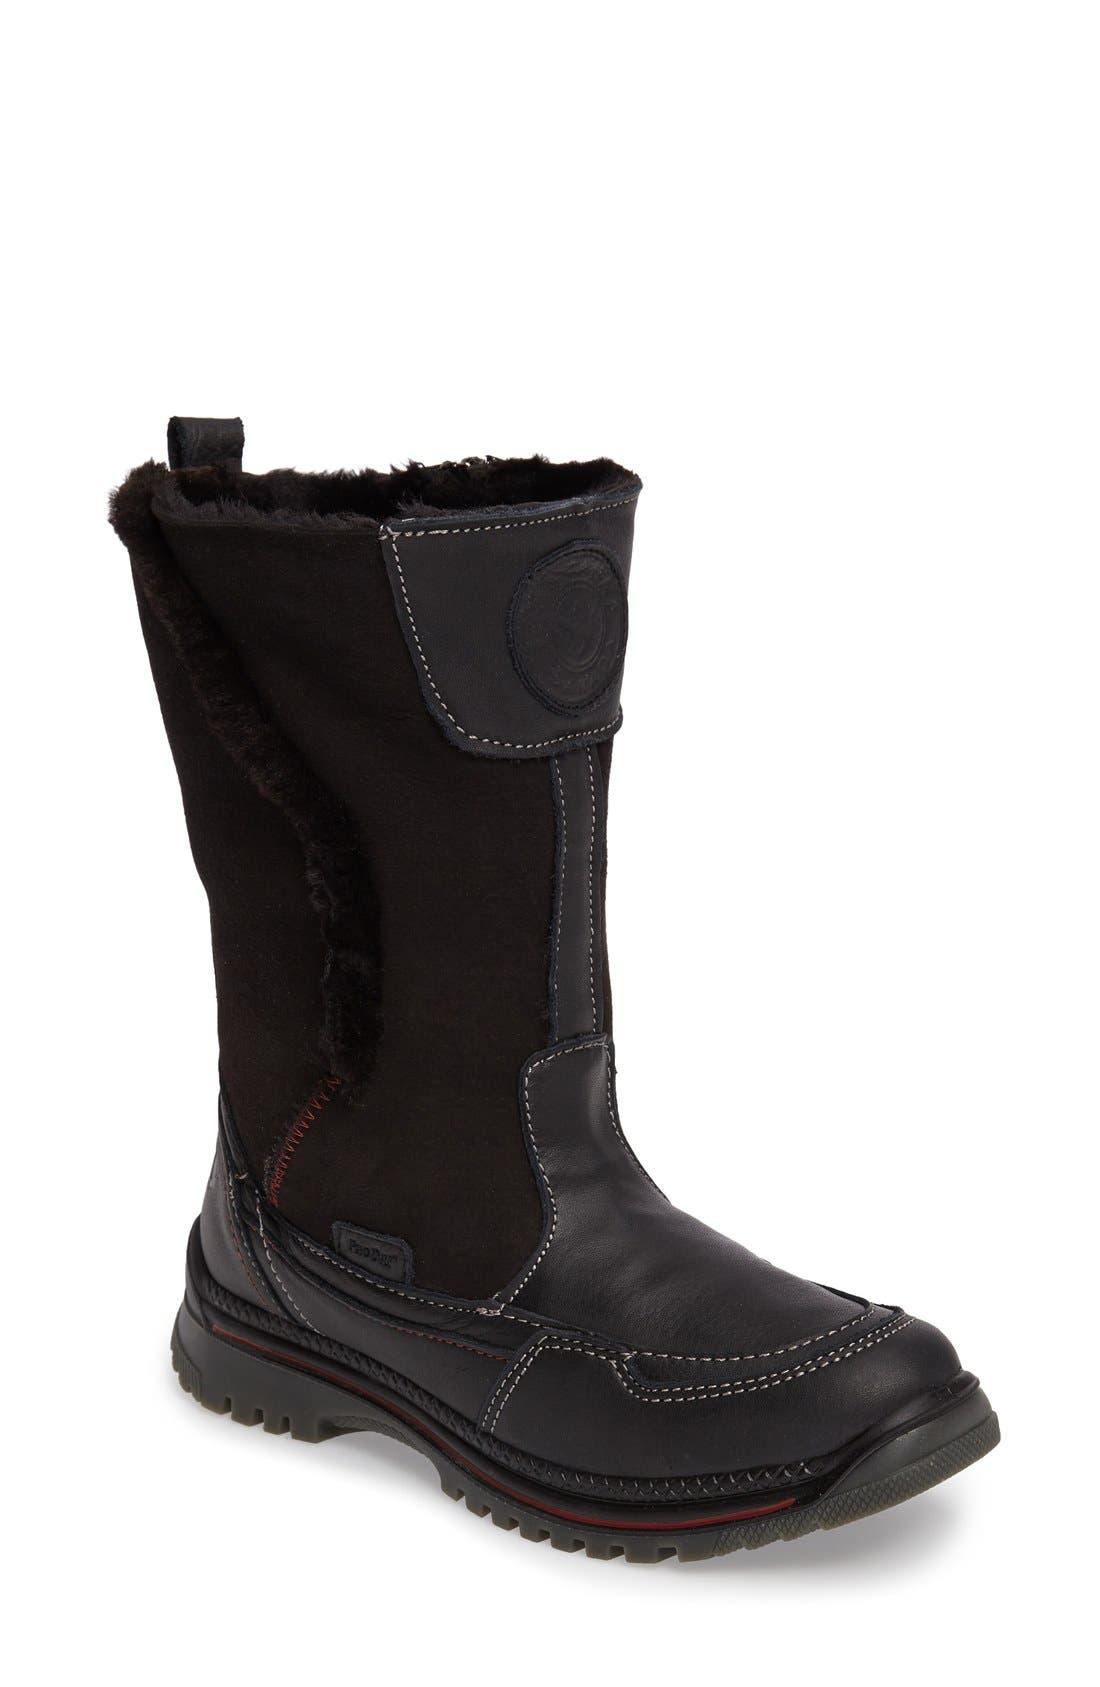 Seraphine Genuine Shearling Waterproof Winter Boot,                             Main thumbnail 1, color,                             001